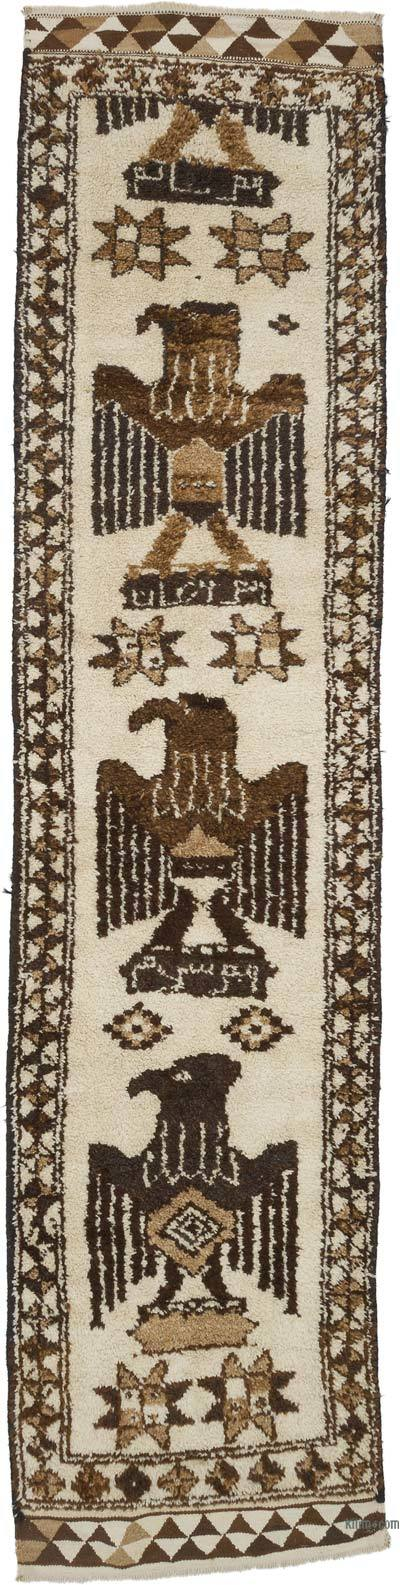 Bej, Kahverengi Vintage Anadolu Yolluk - 94 cm x 393 cm